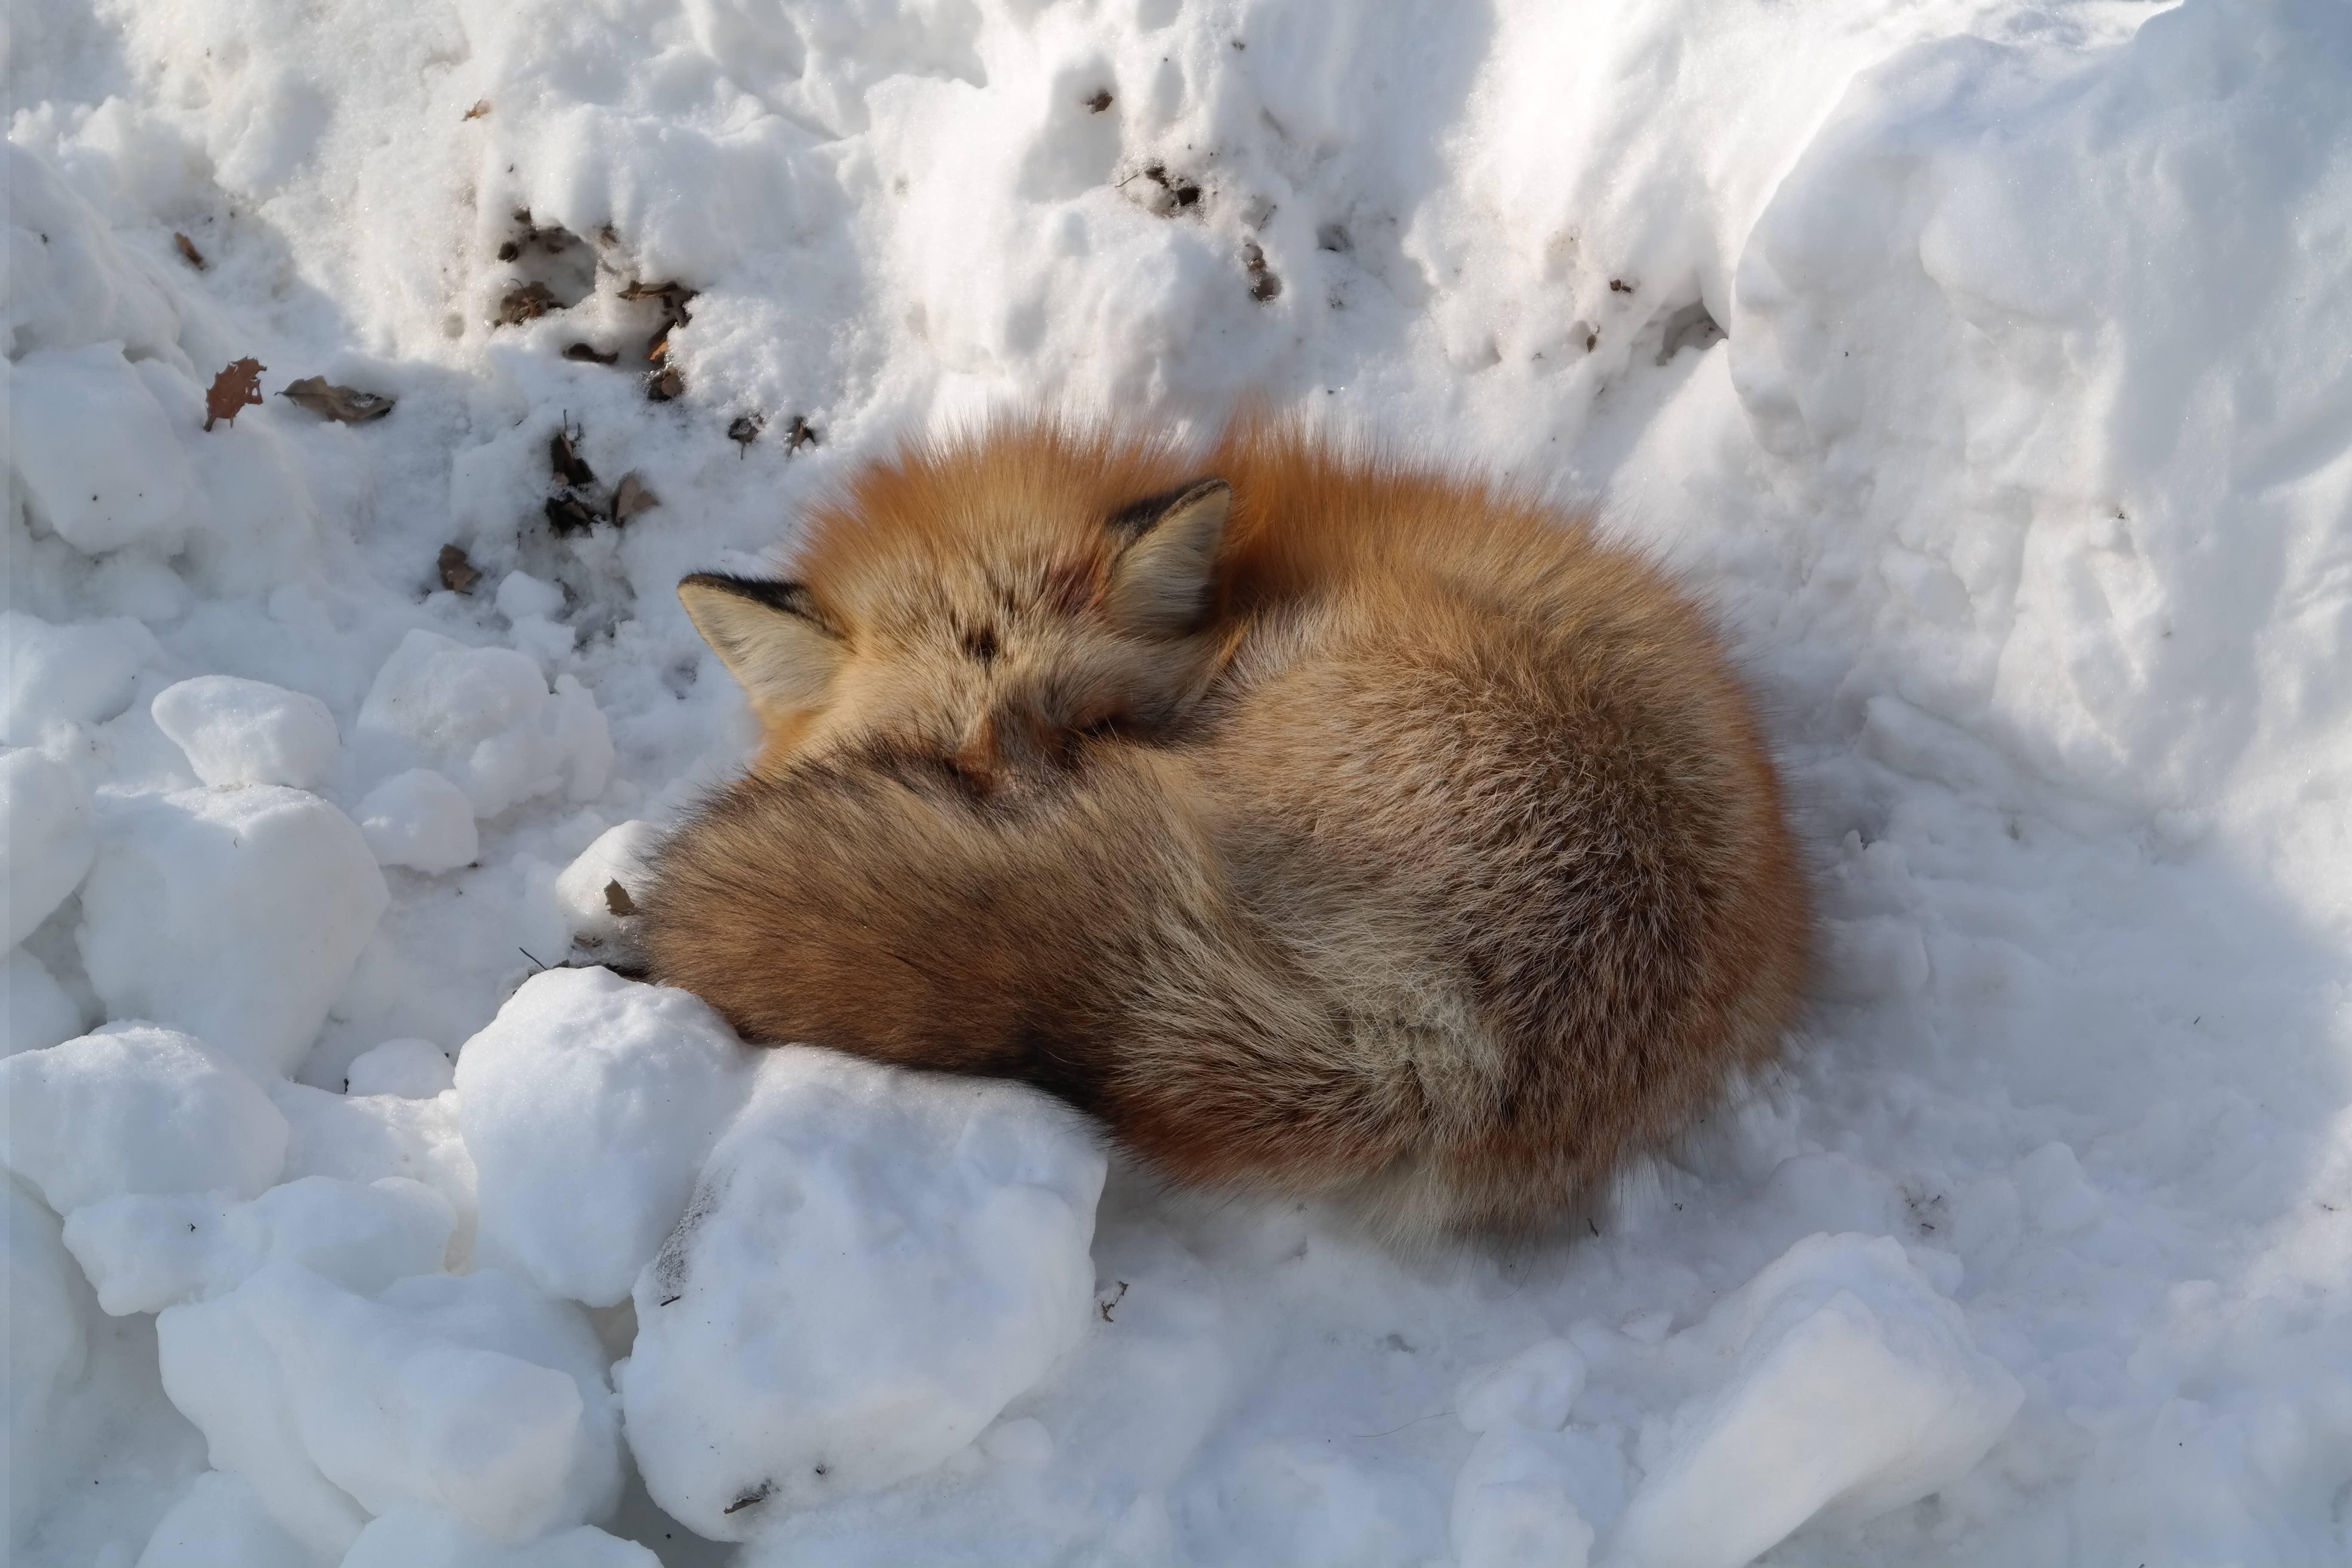 A sleeping fox at Zao Fox Village, Japan.